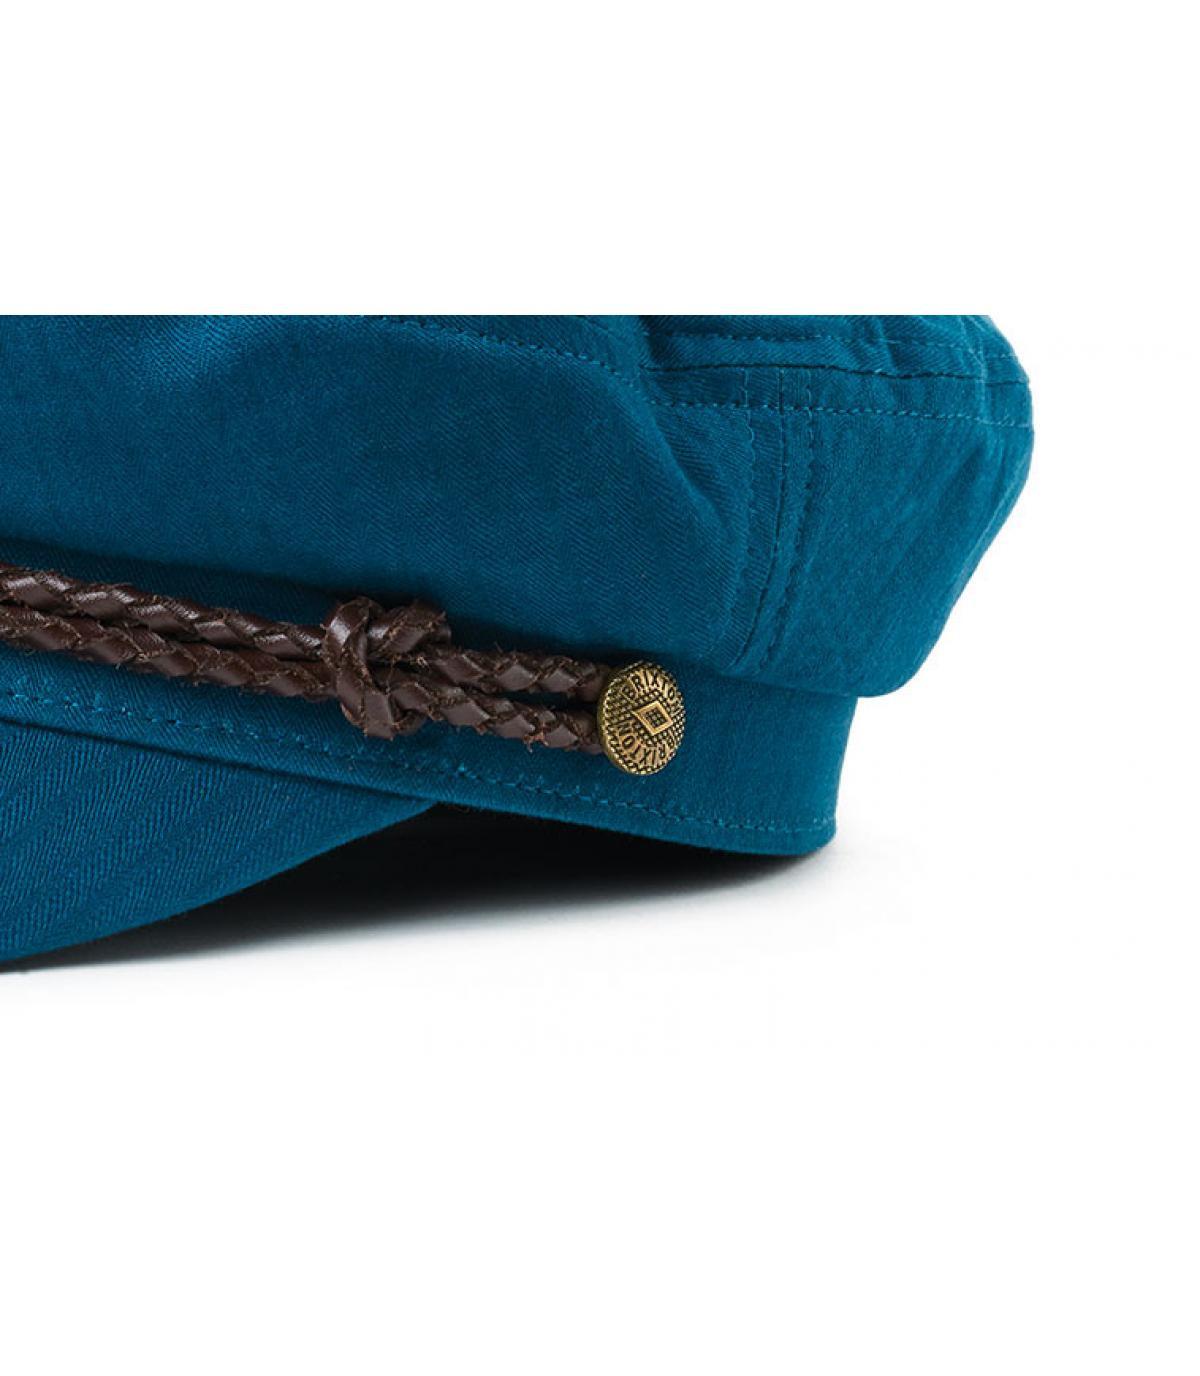 Details Ashland orion blue brown - Abbildung 3